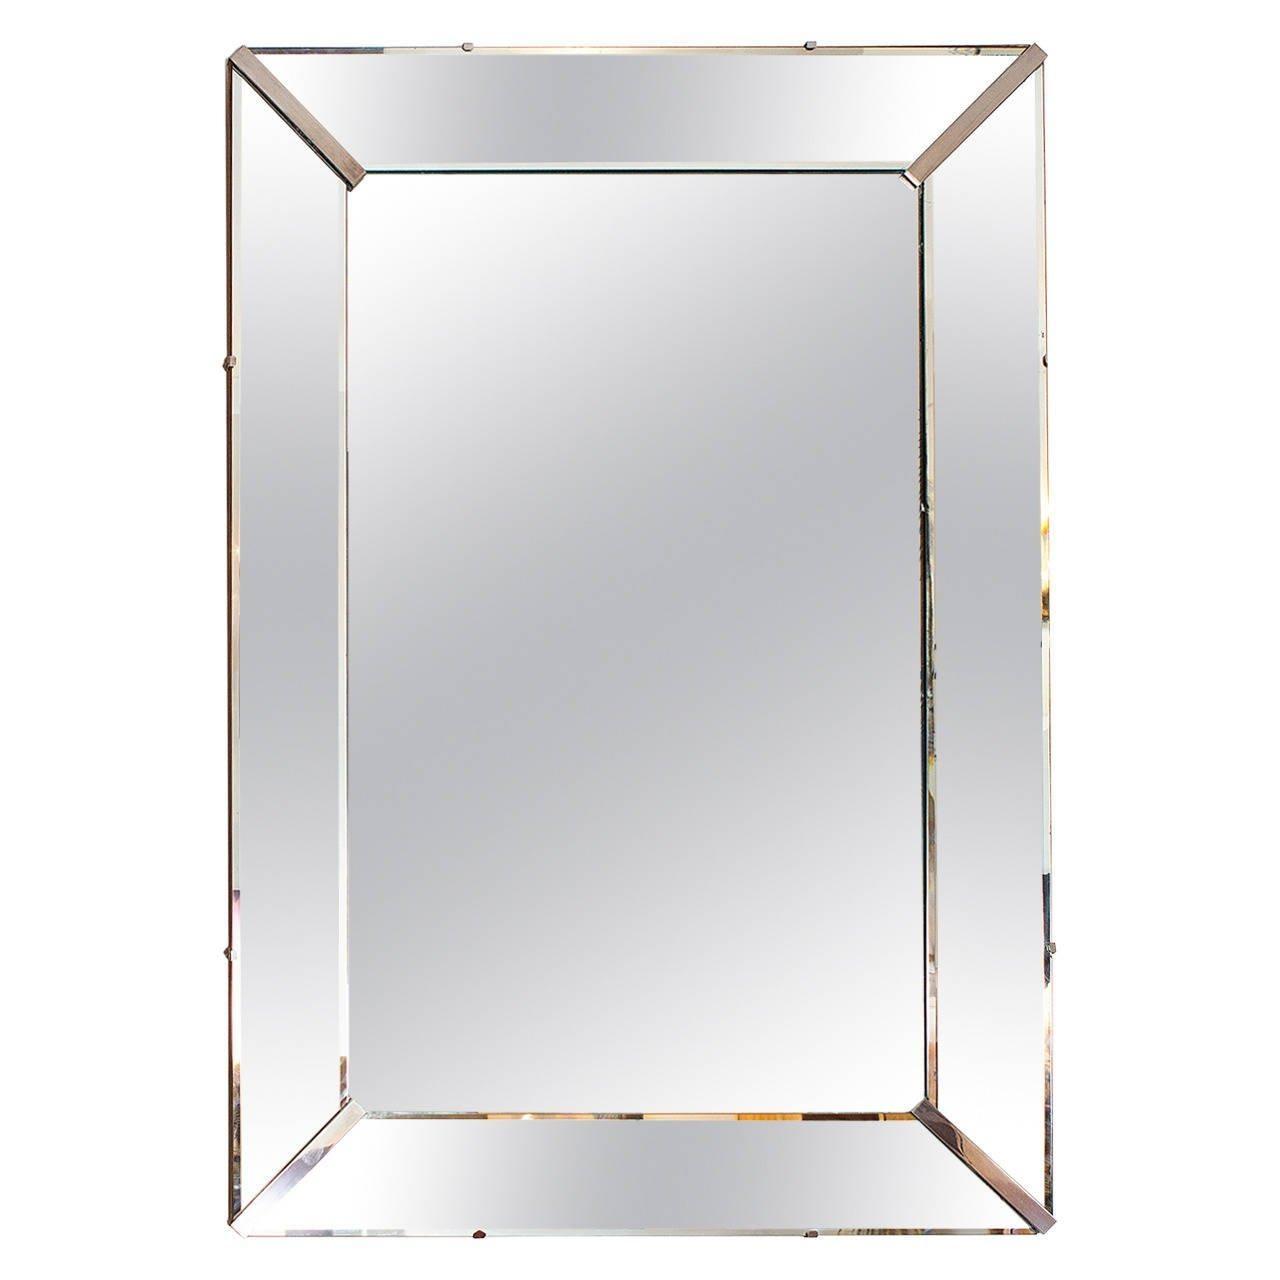 Elegant Art Deco Wall Mirror, France Circa 1940 At 1Stdibs In Art Deco Wall Mirror (Image 12 of 20)